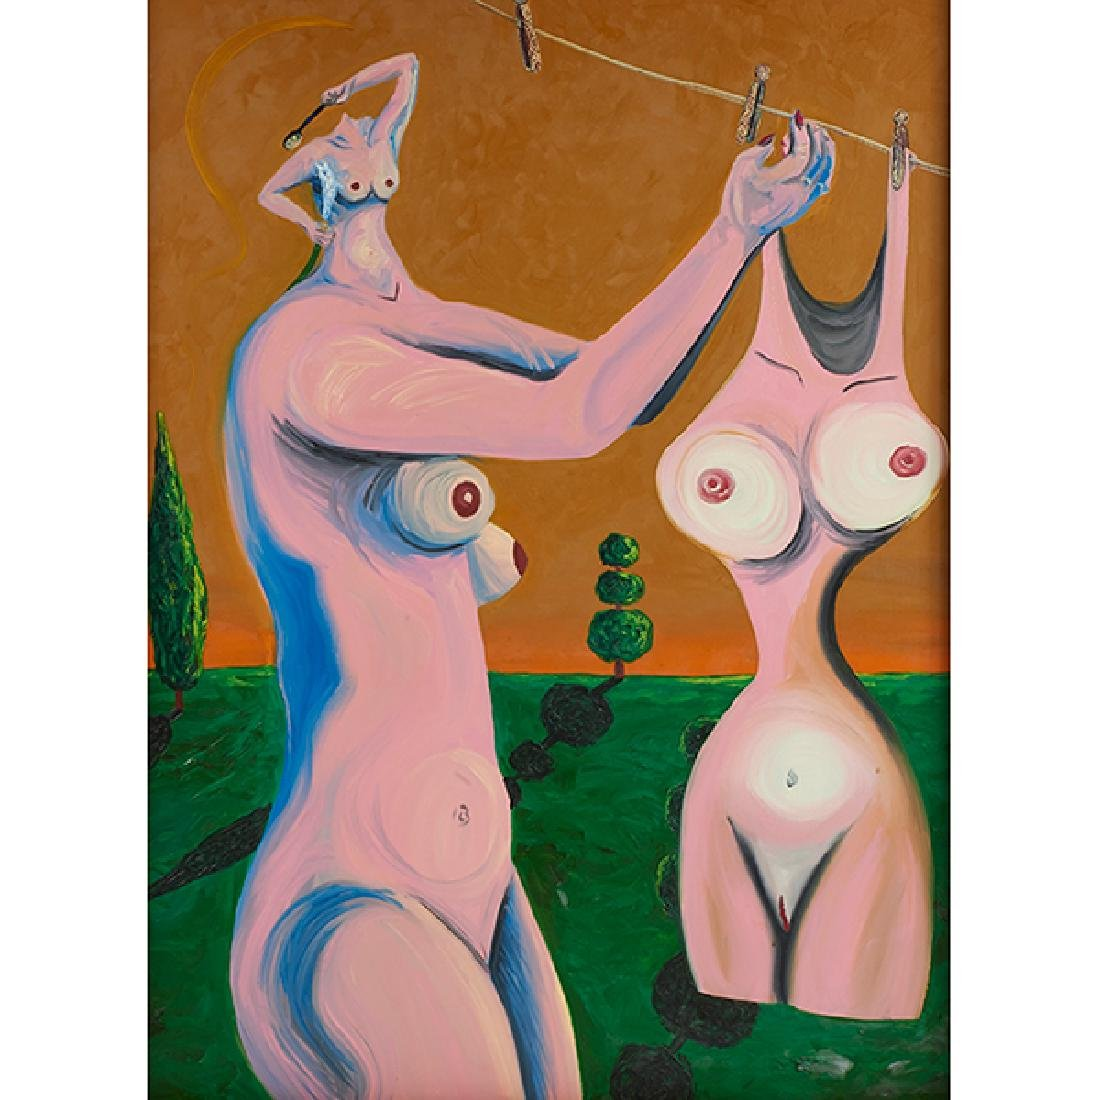 Neraldo De la Paz, All Washed Up, 1984, oil on canvas,